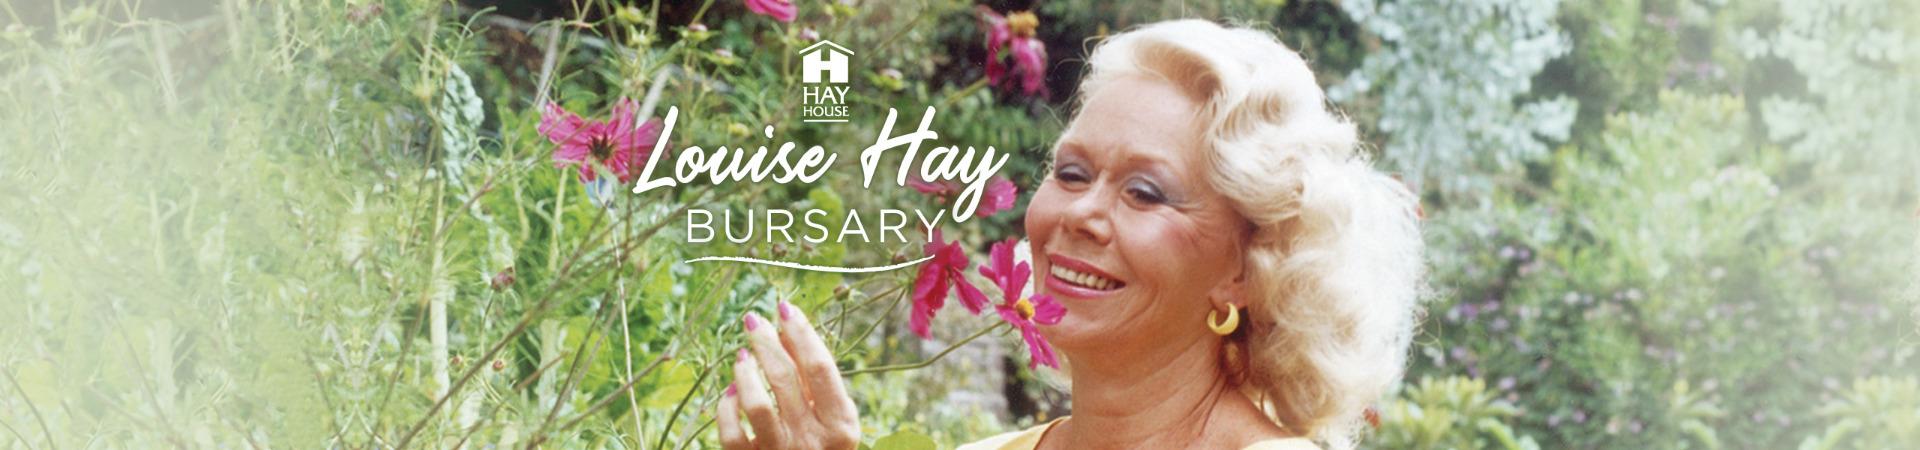 Louise Hay Bursary